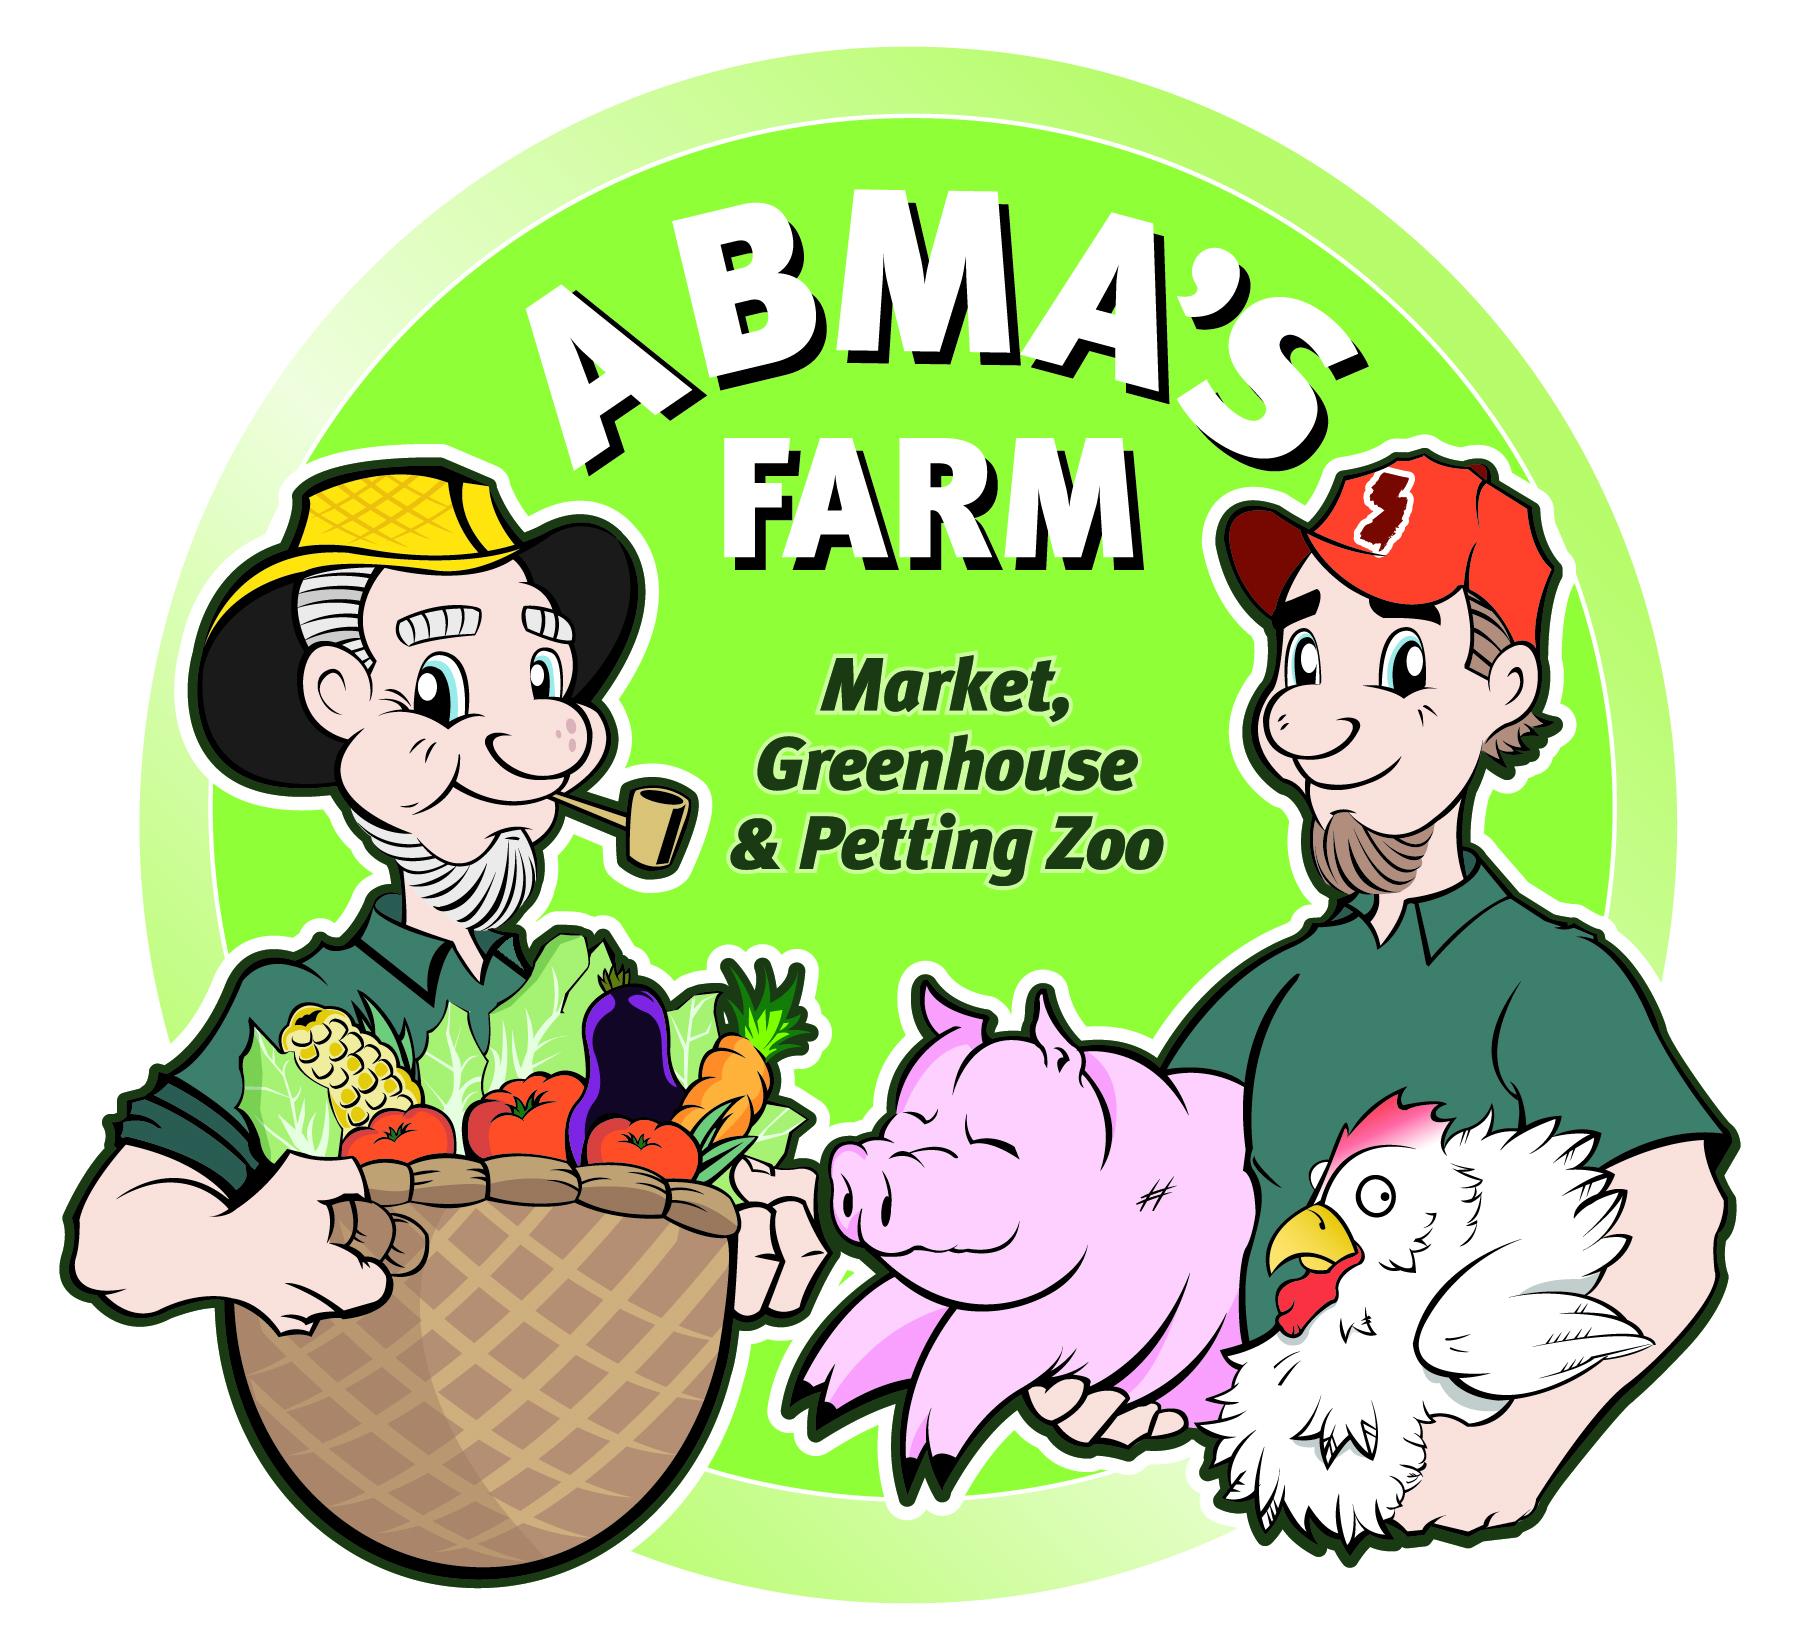 Abma's Farm Market & Nursery